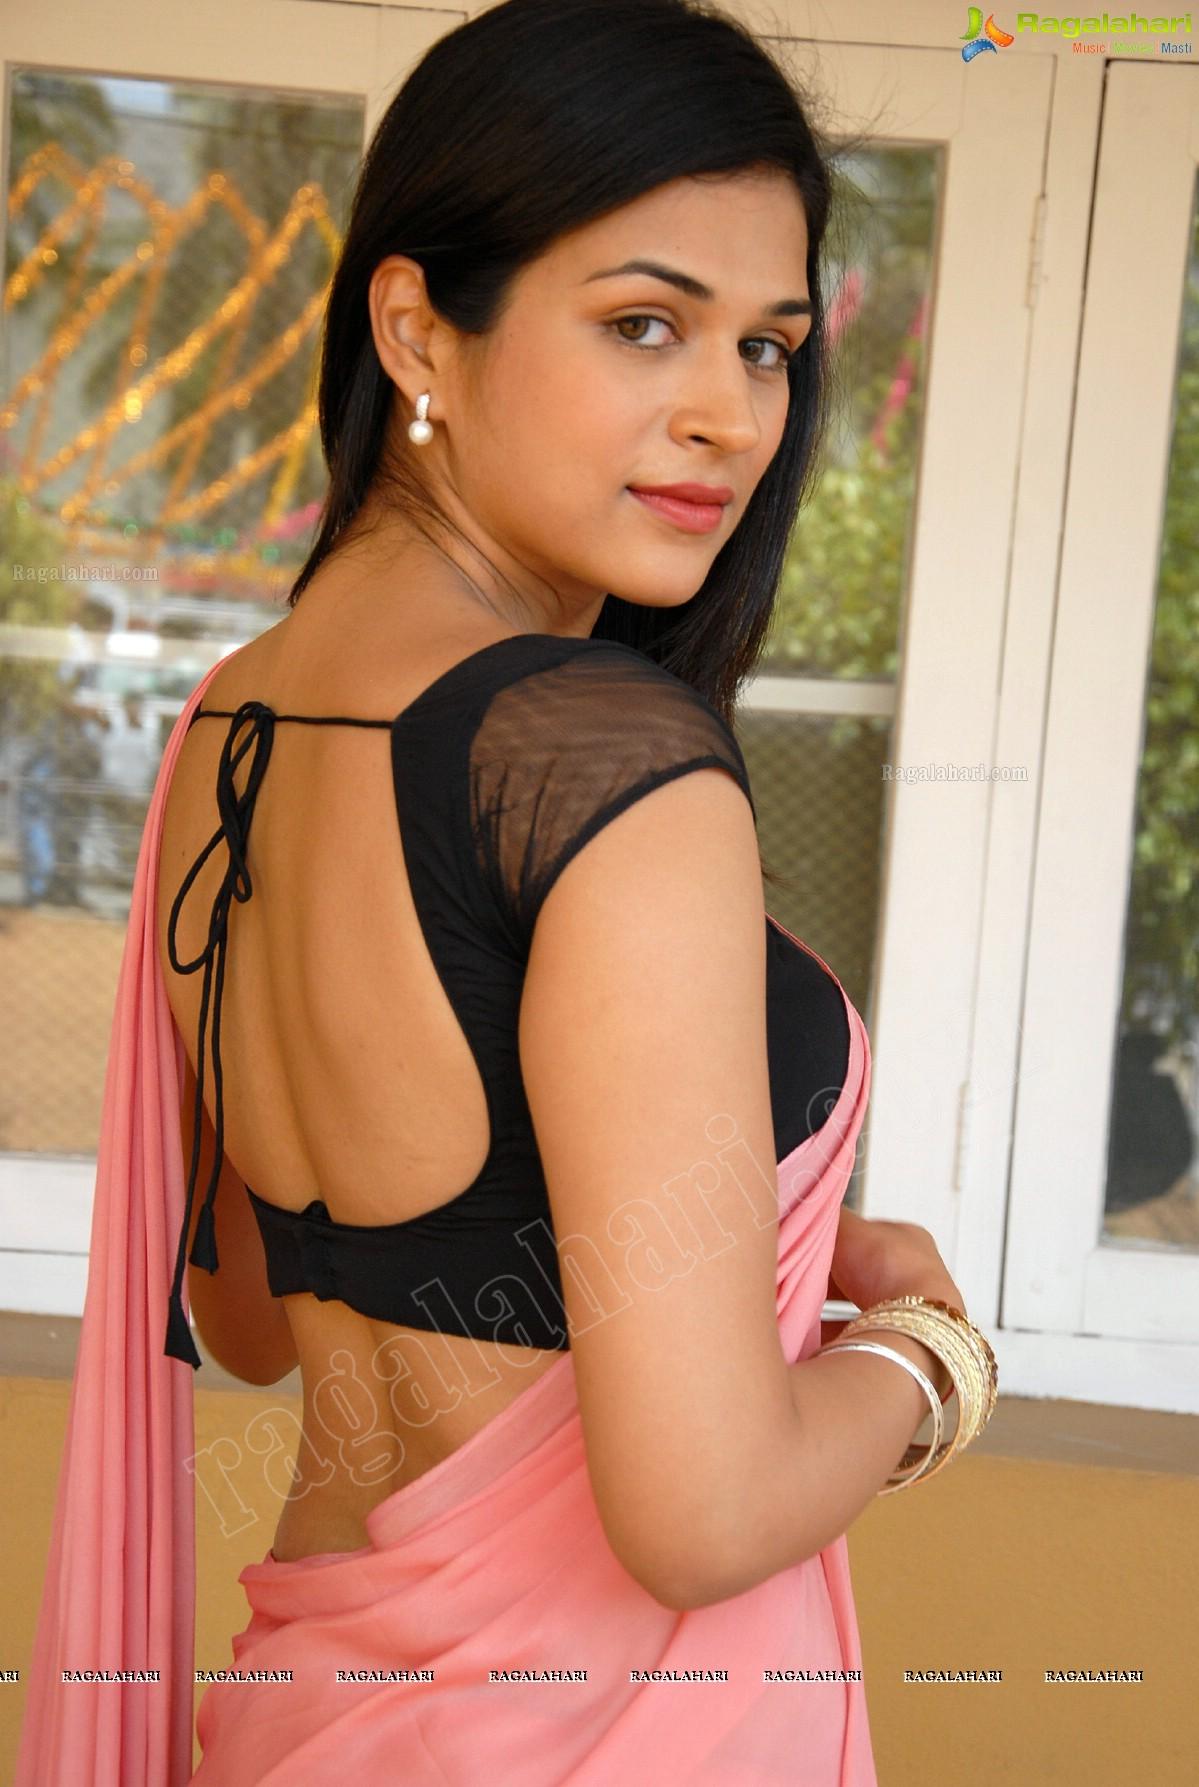 Shraddha Das (Hi-Res) Image 9 | Tollywood Actress ...